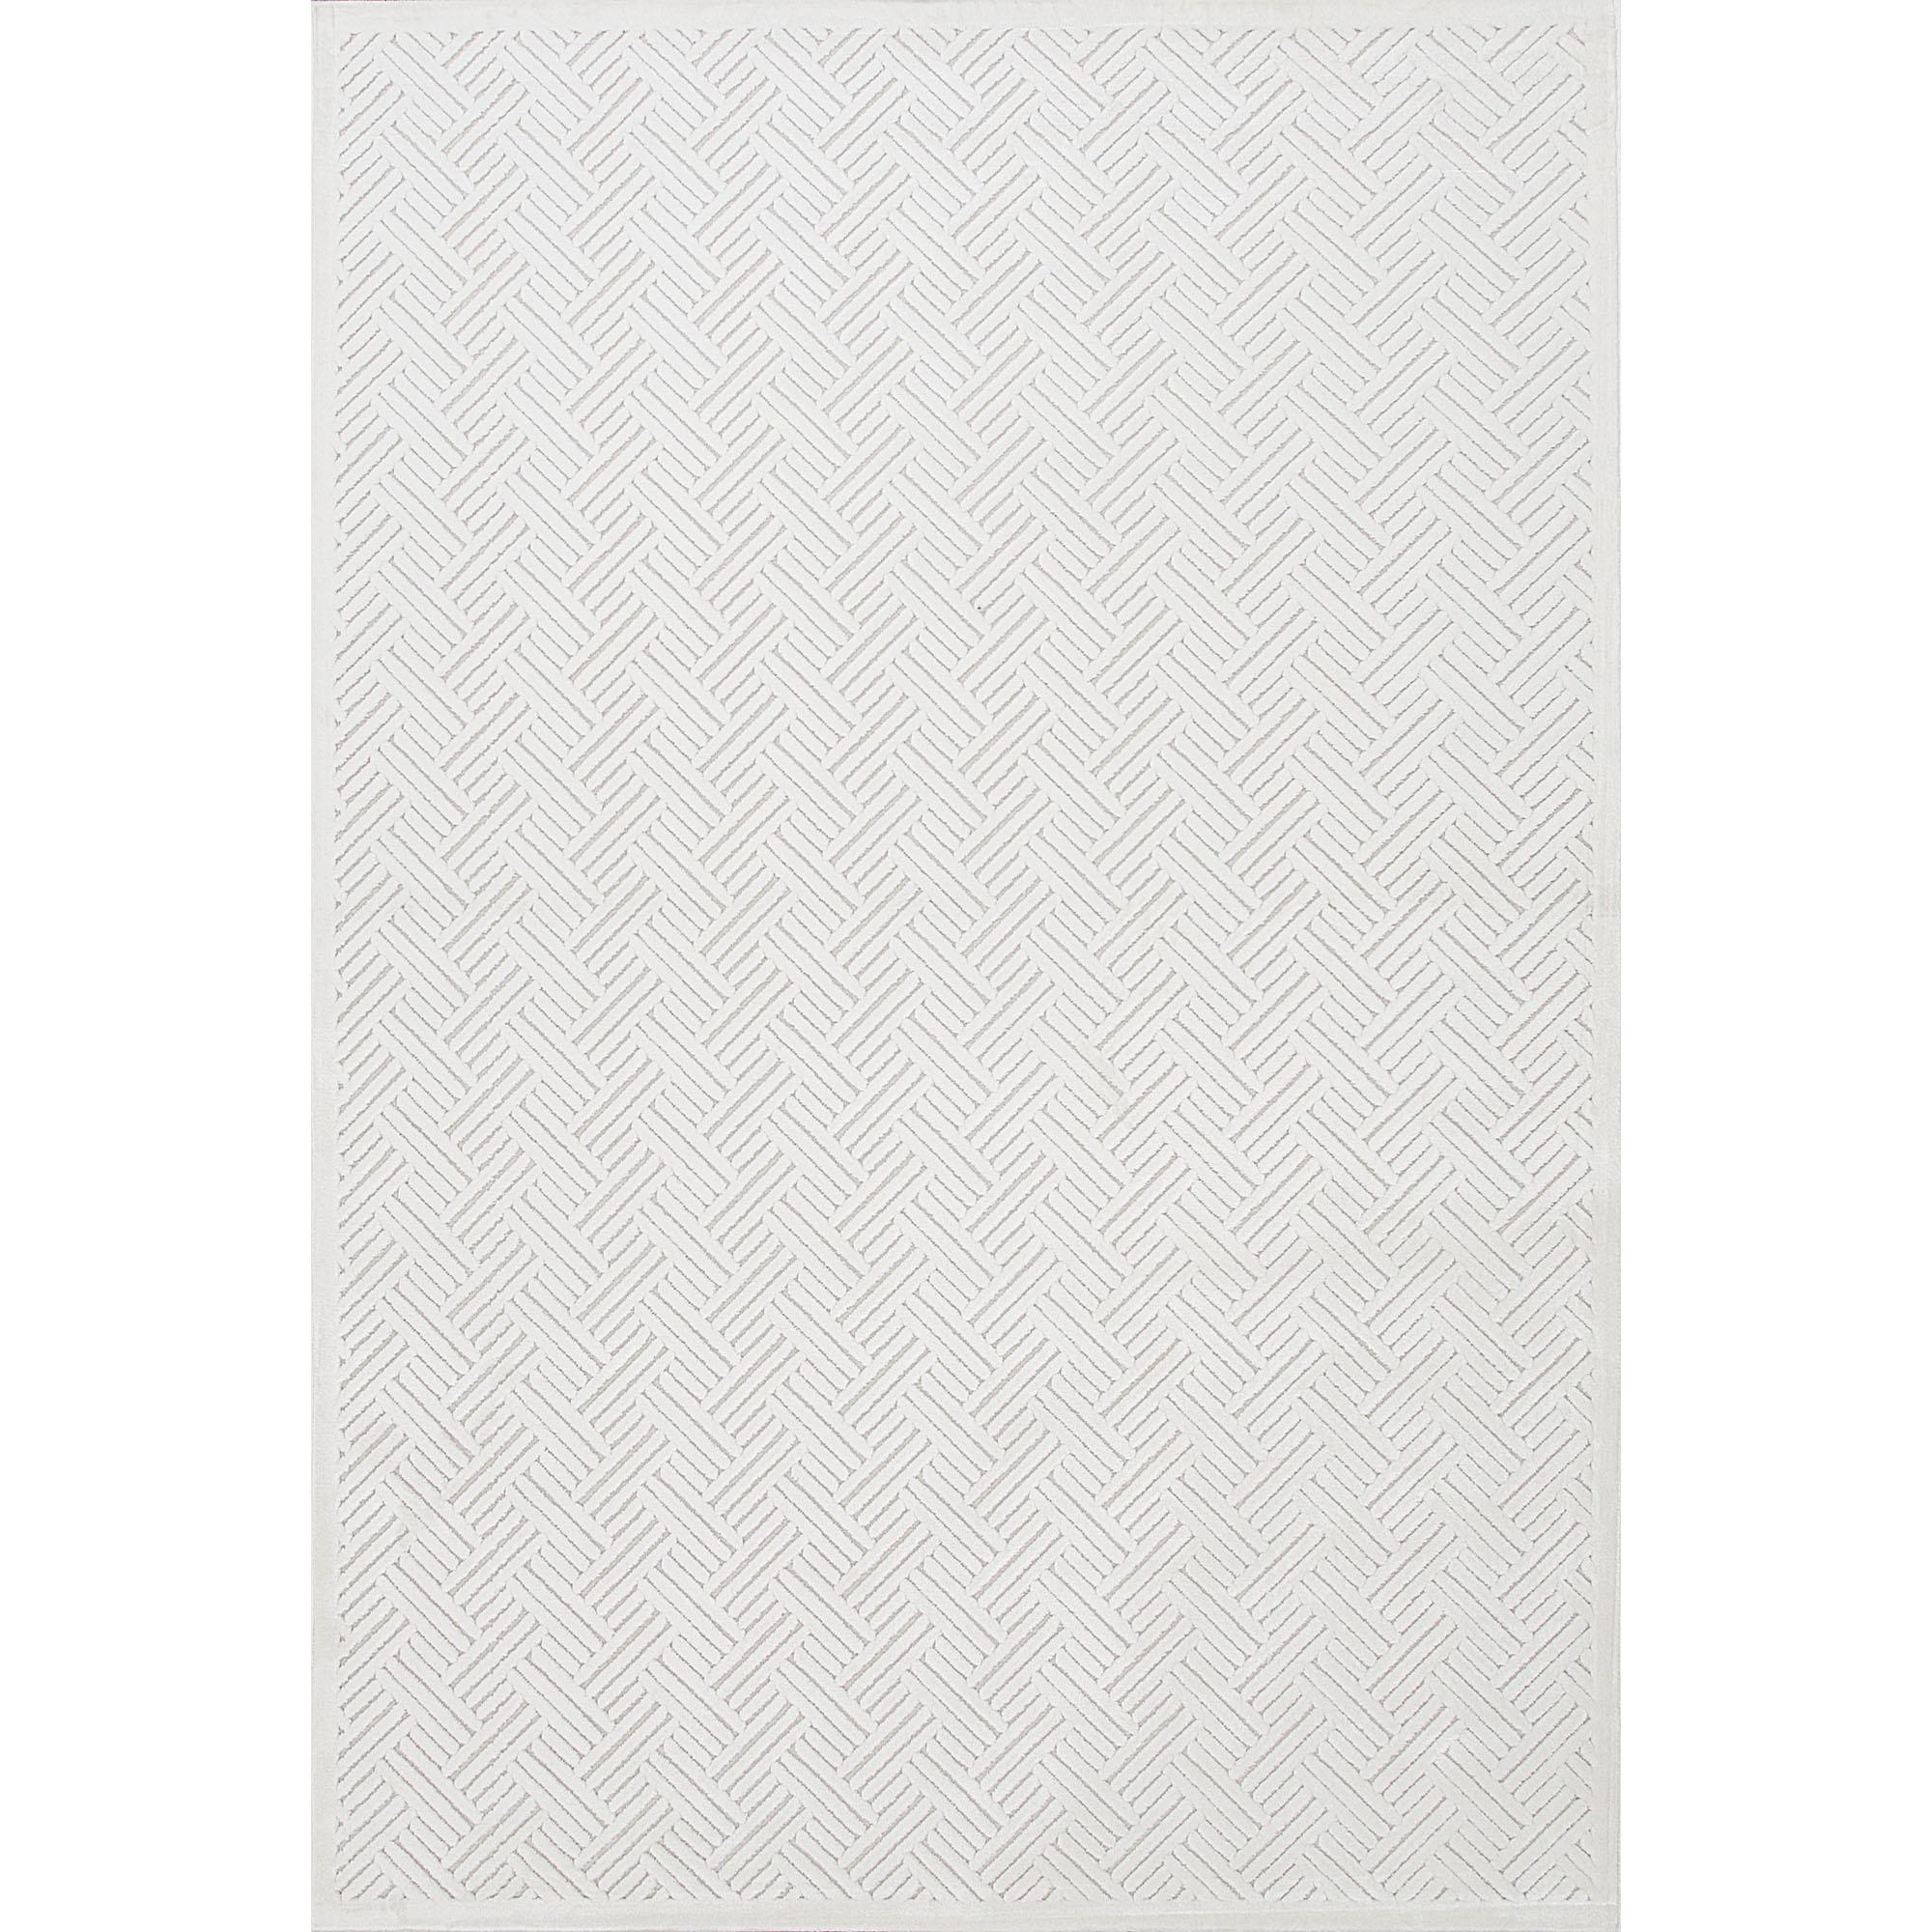 JAIPUR Rugs Fables 5 x 7.6 Rug - Item Number: RUG108686